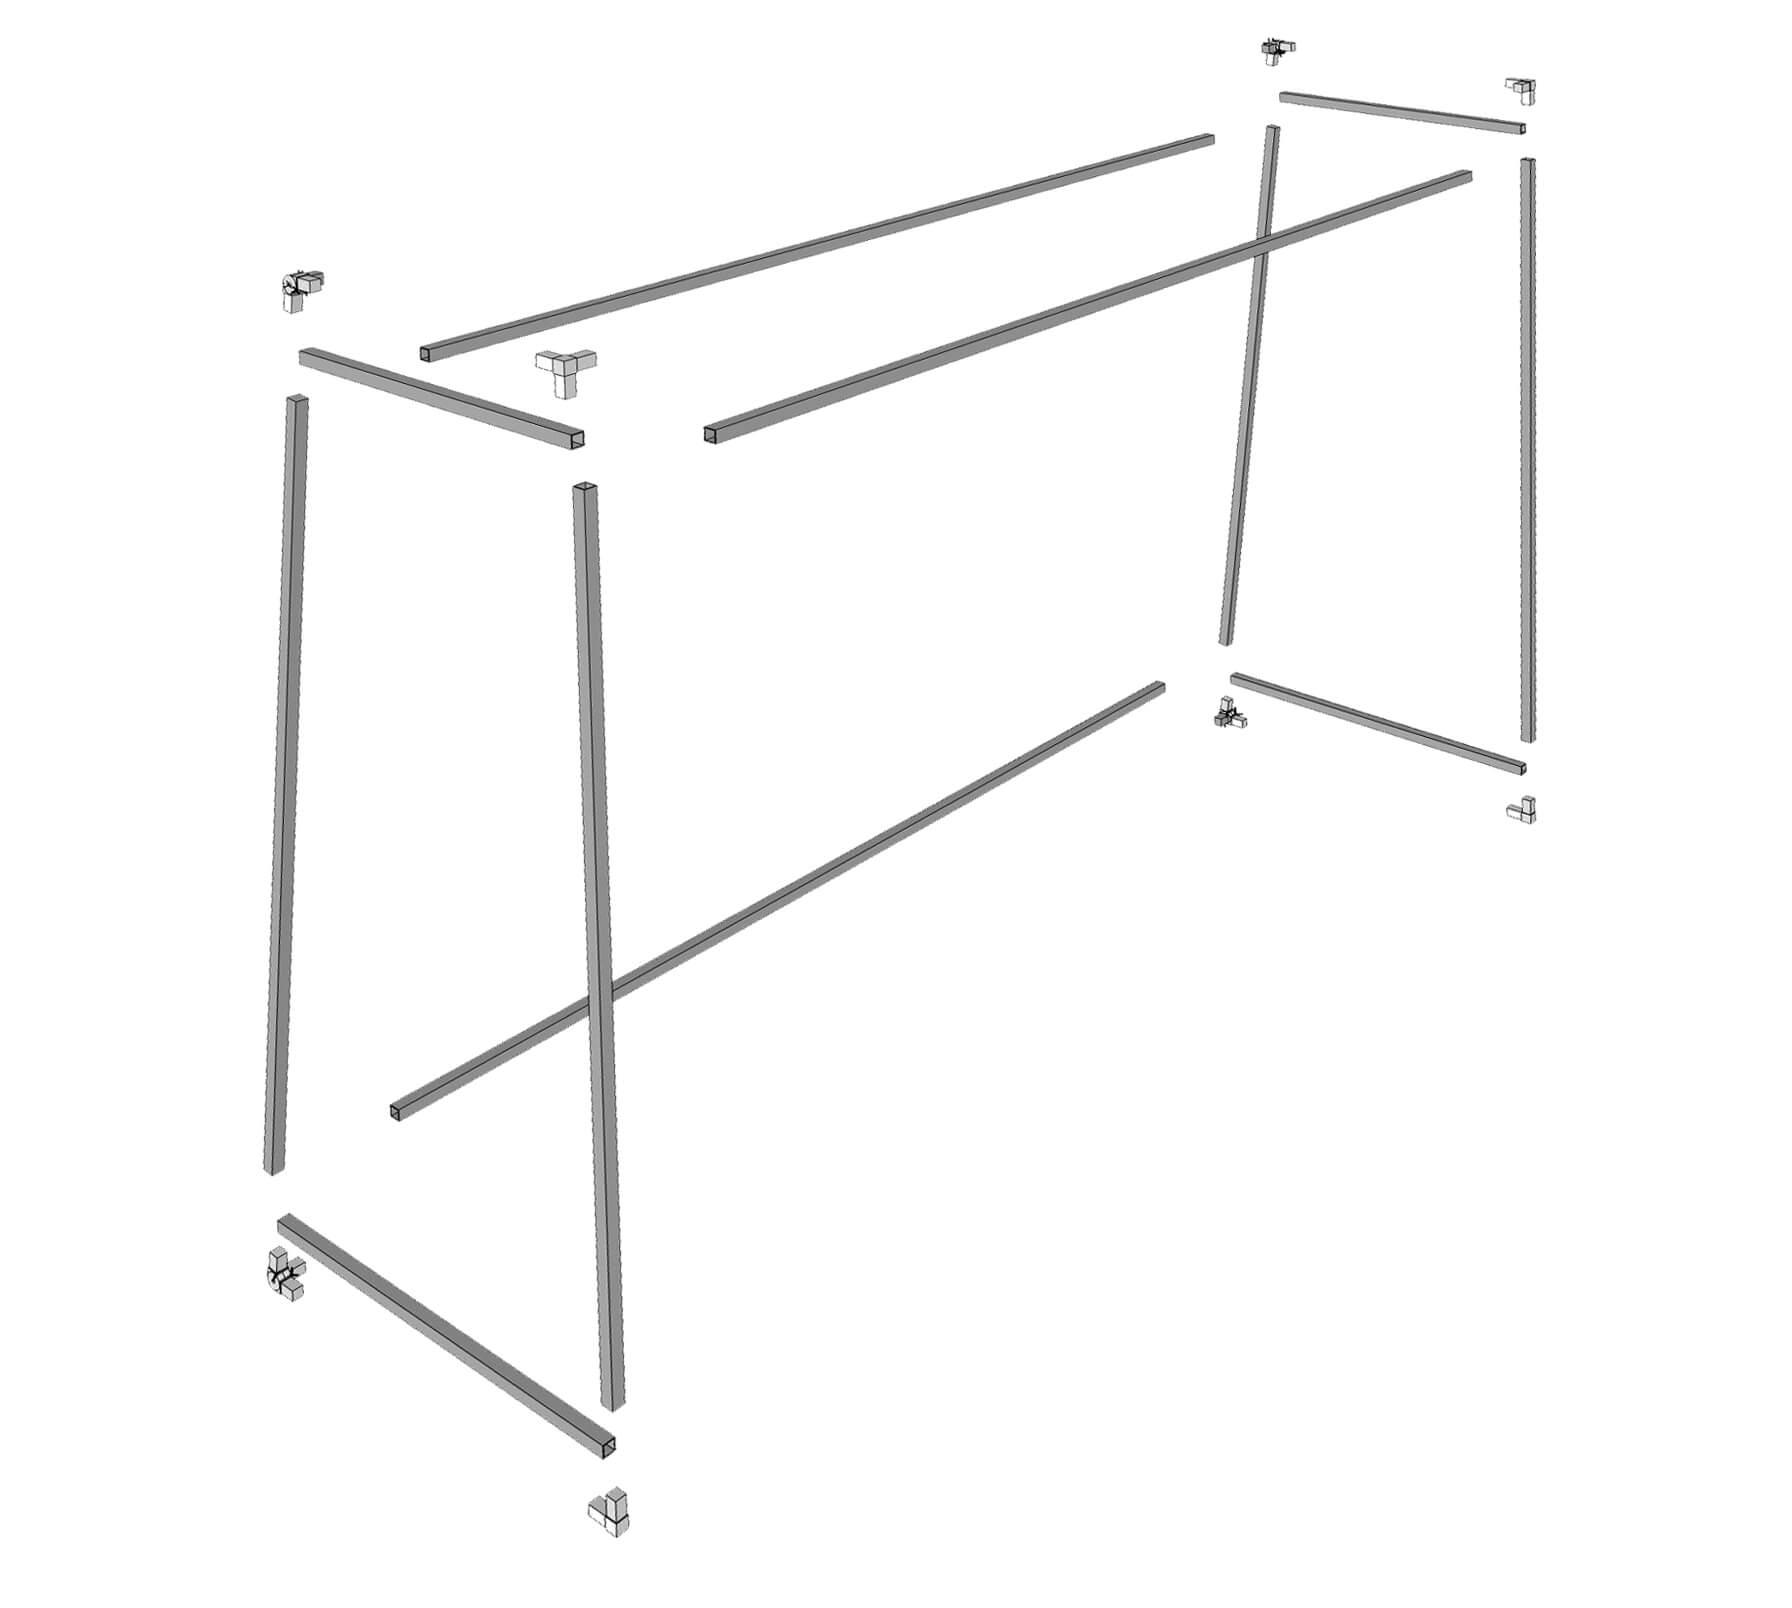 Fußballtor Konstruktion Anleitung